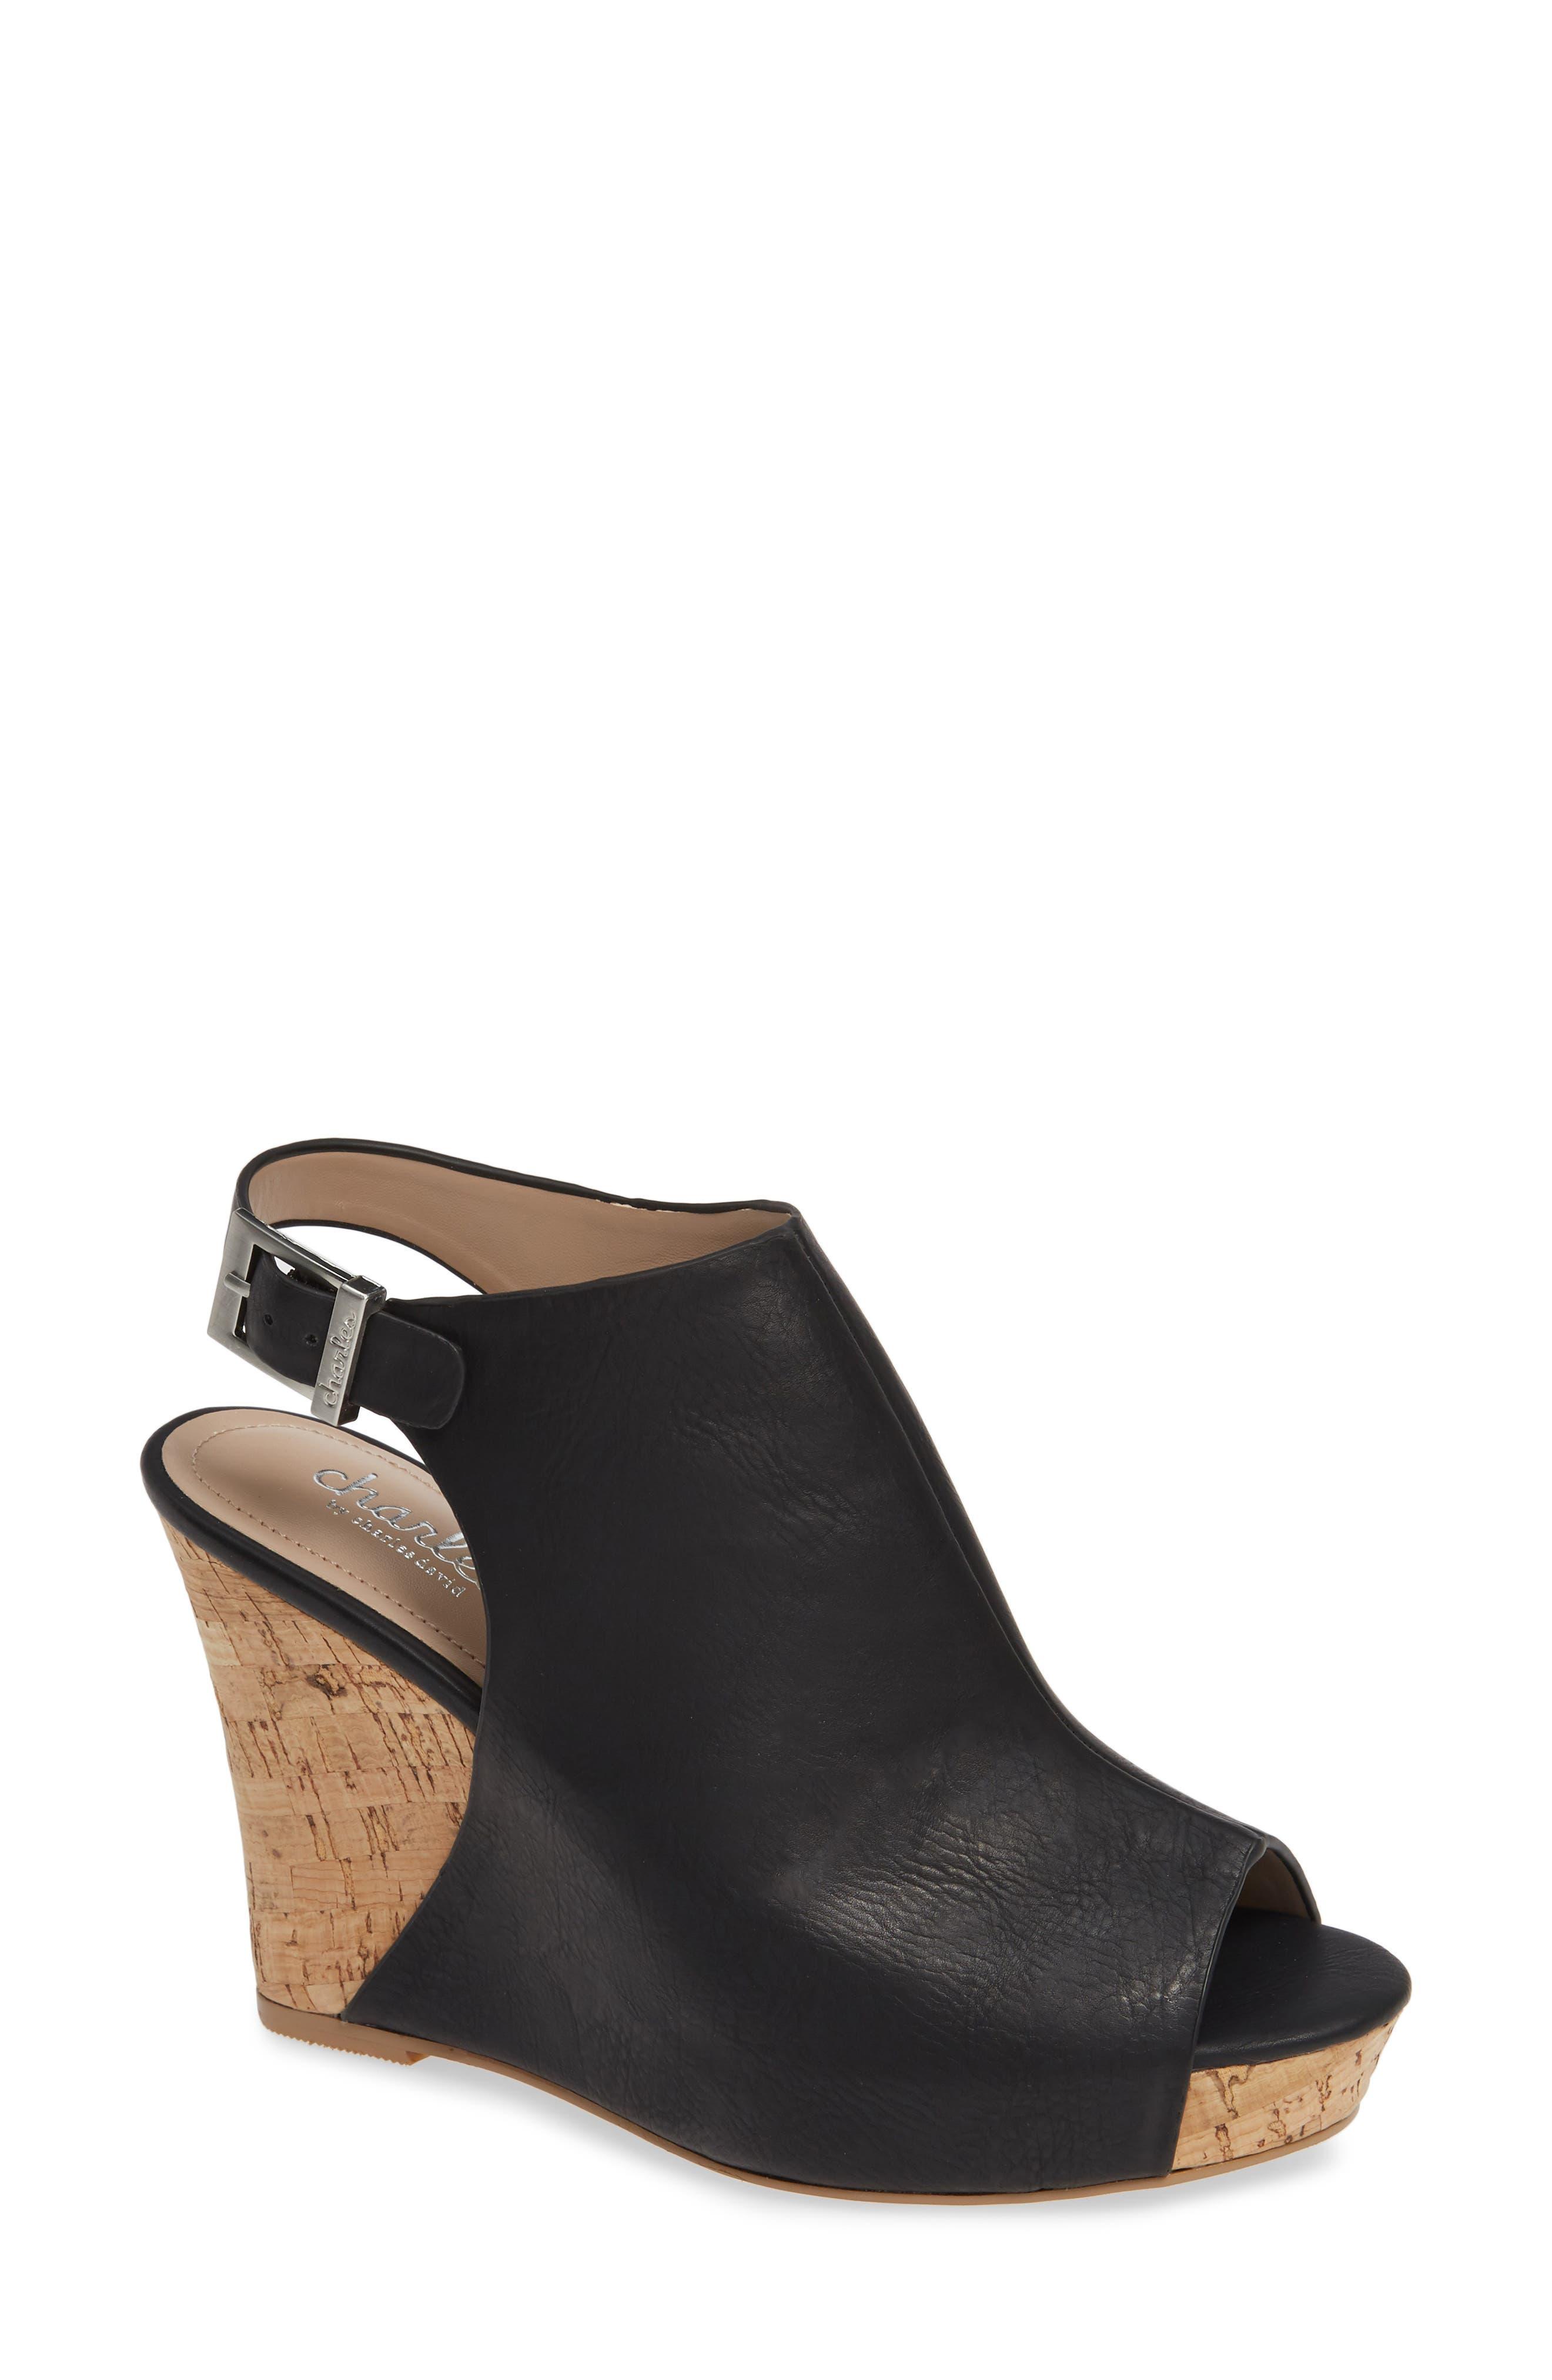 Charles By Charles David Lobby Slingback Wedge Sandal, Black